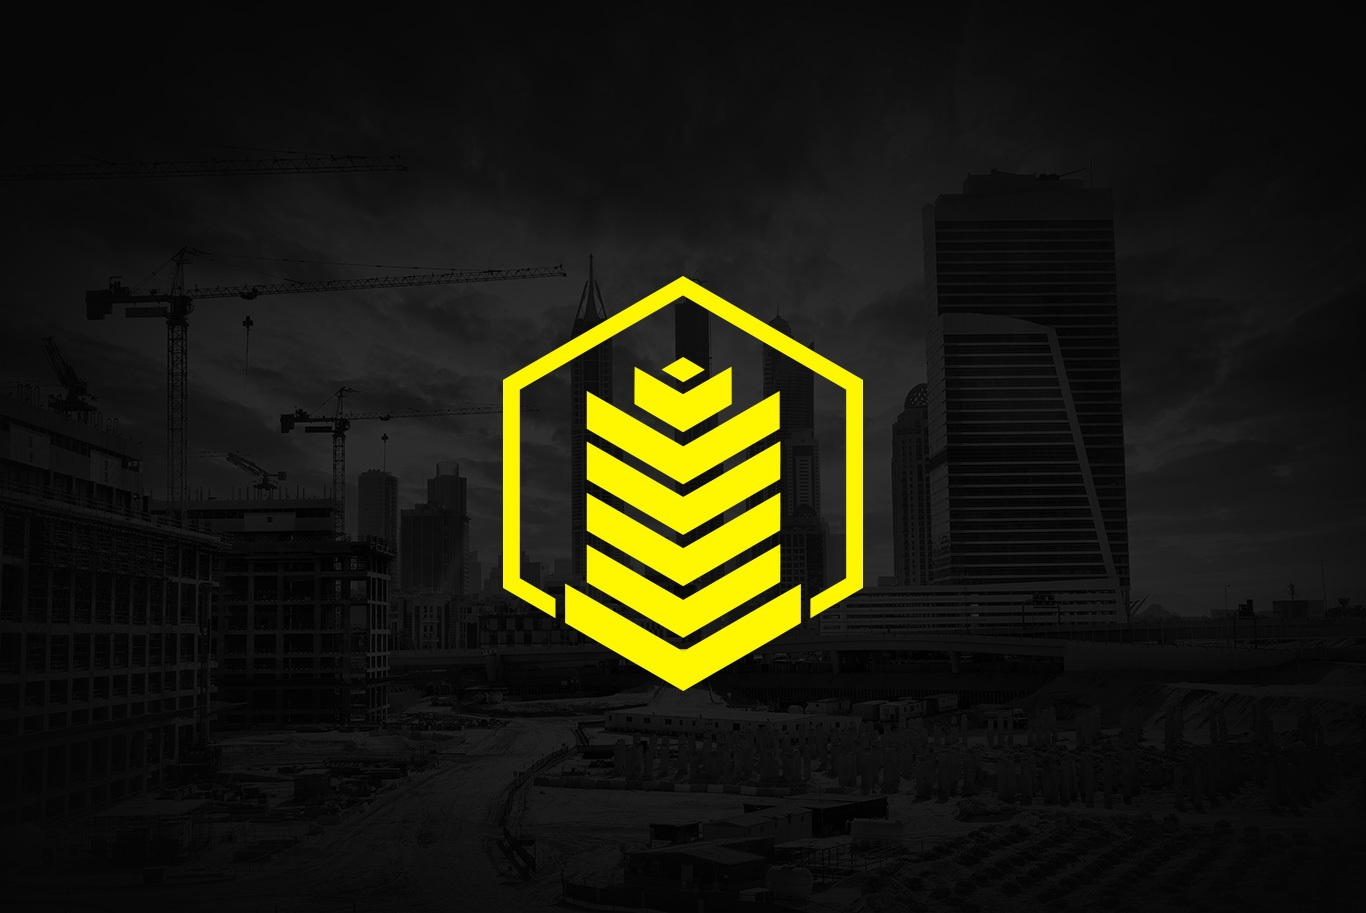 gunther logo and symbol designed by vandalia studio